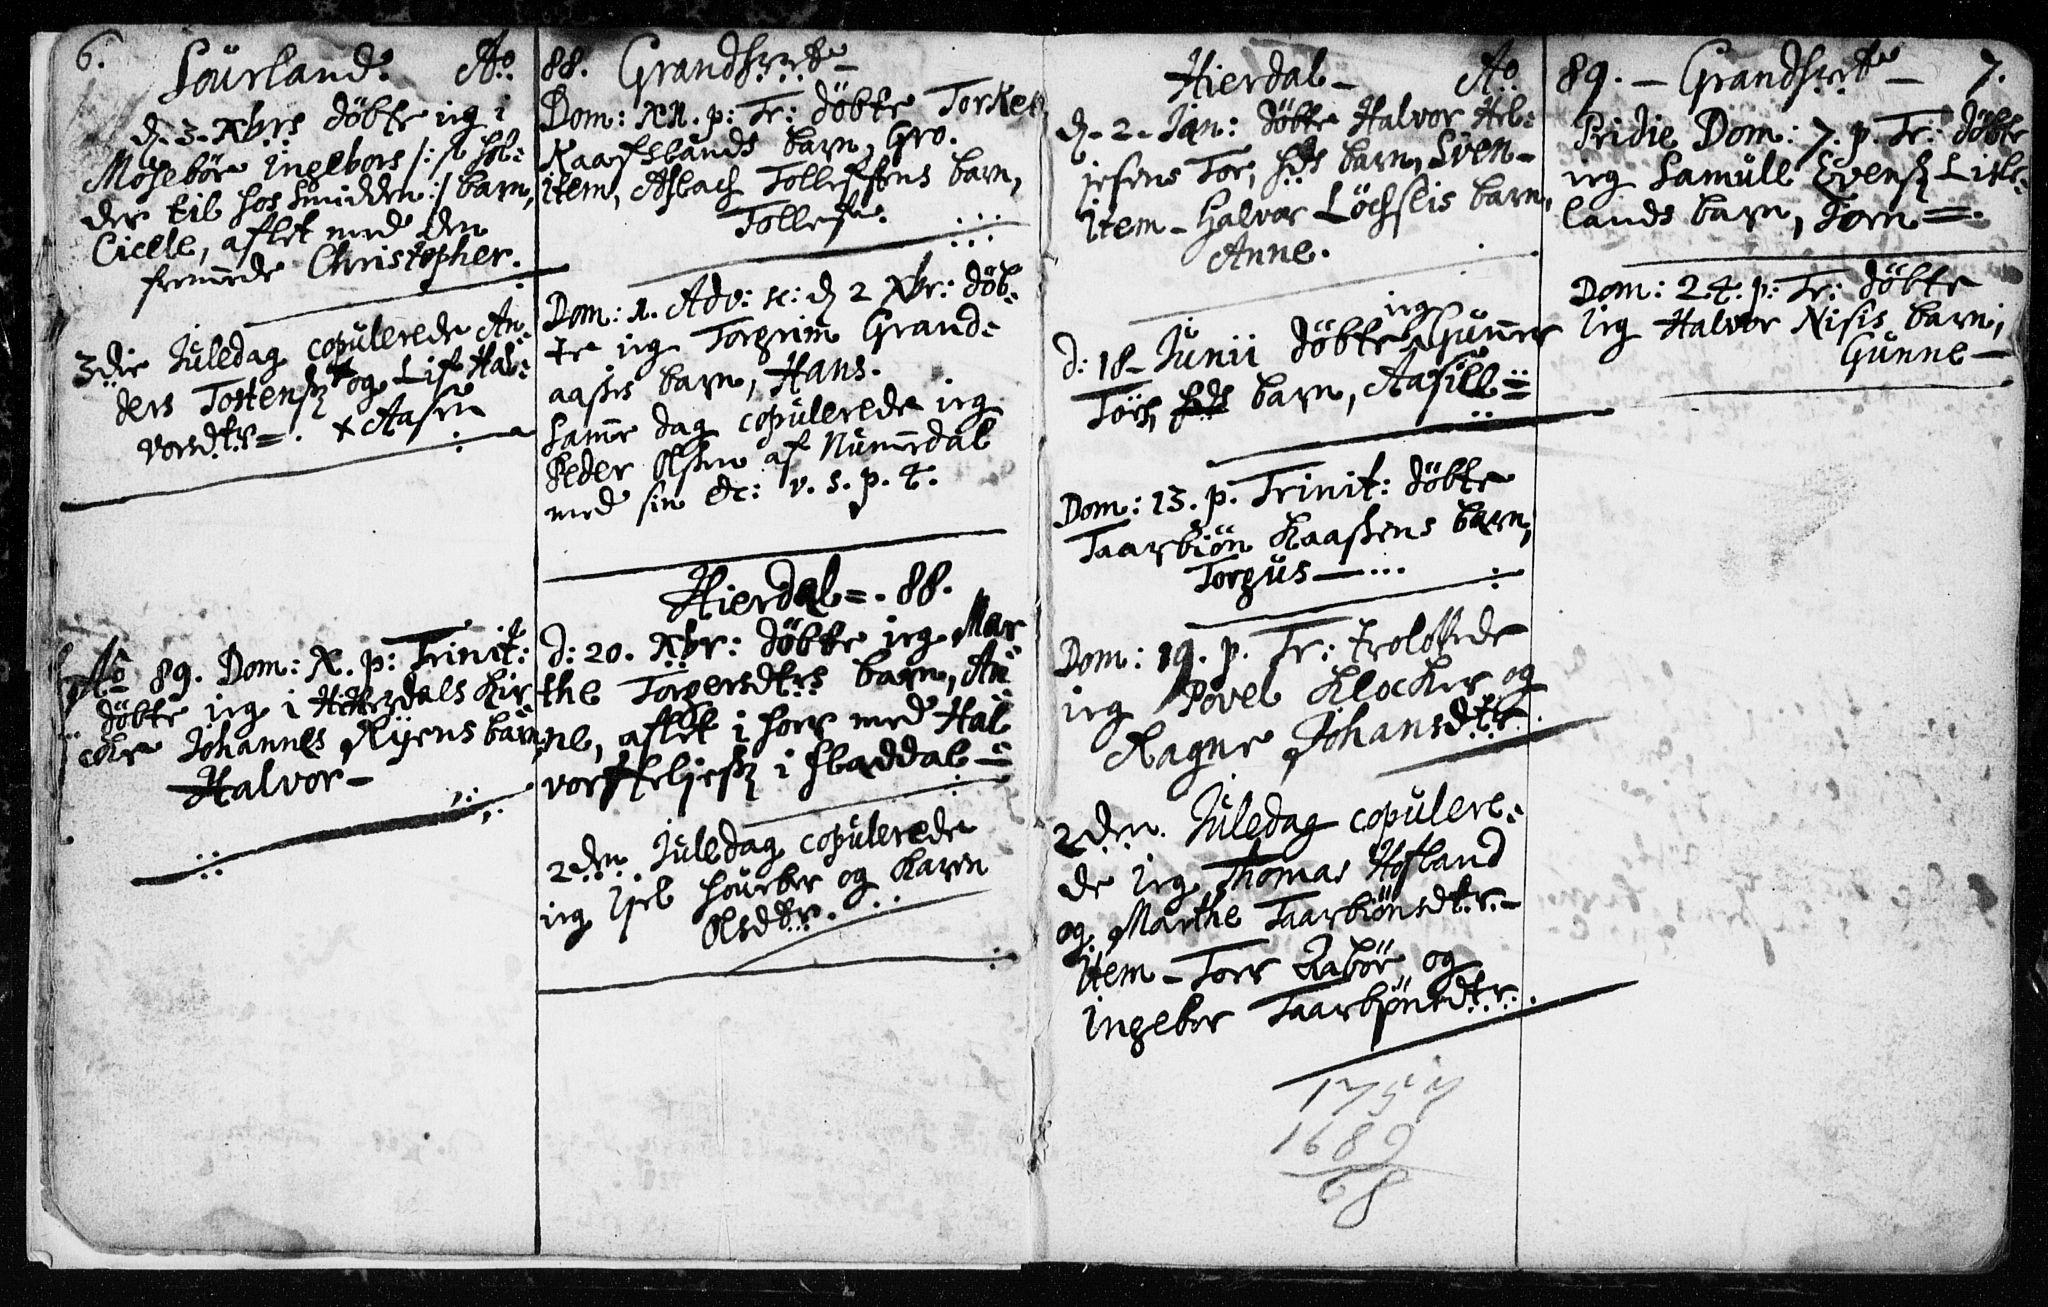 SAKO, Hjartdal kirkebøker, F/Fa/L0001: Ministerialbok nr. I 1, 1685-1714, s. 6-7